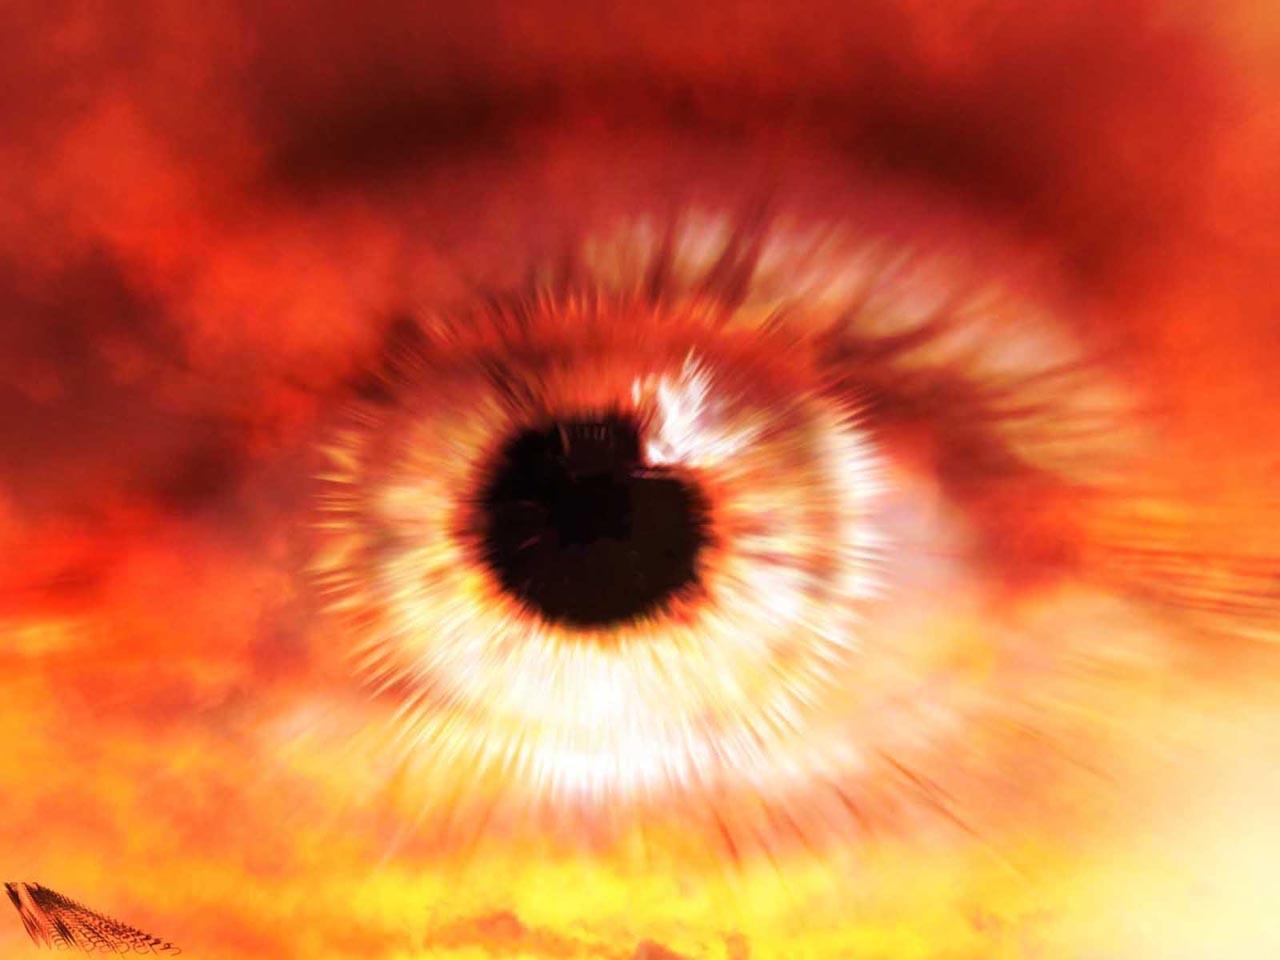 eye wallpaper 3d,eye,iris,red,close up,organ